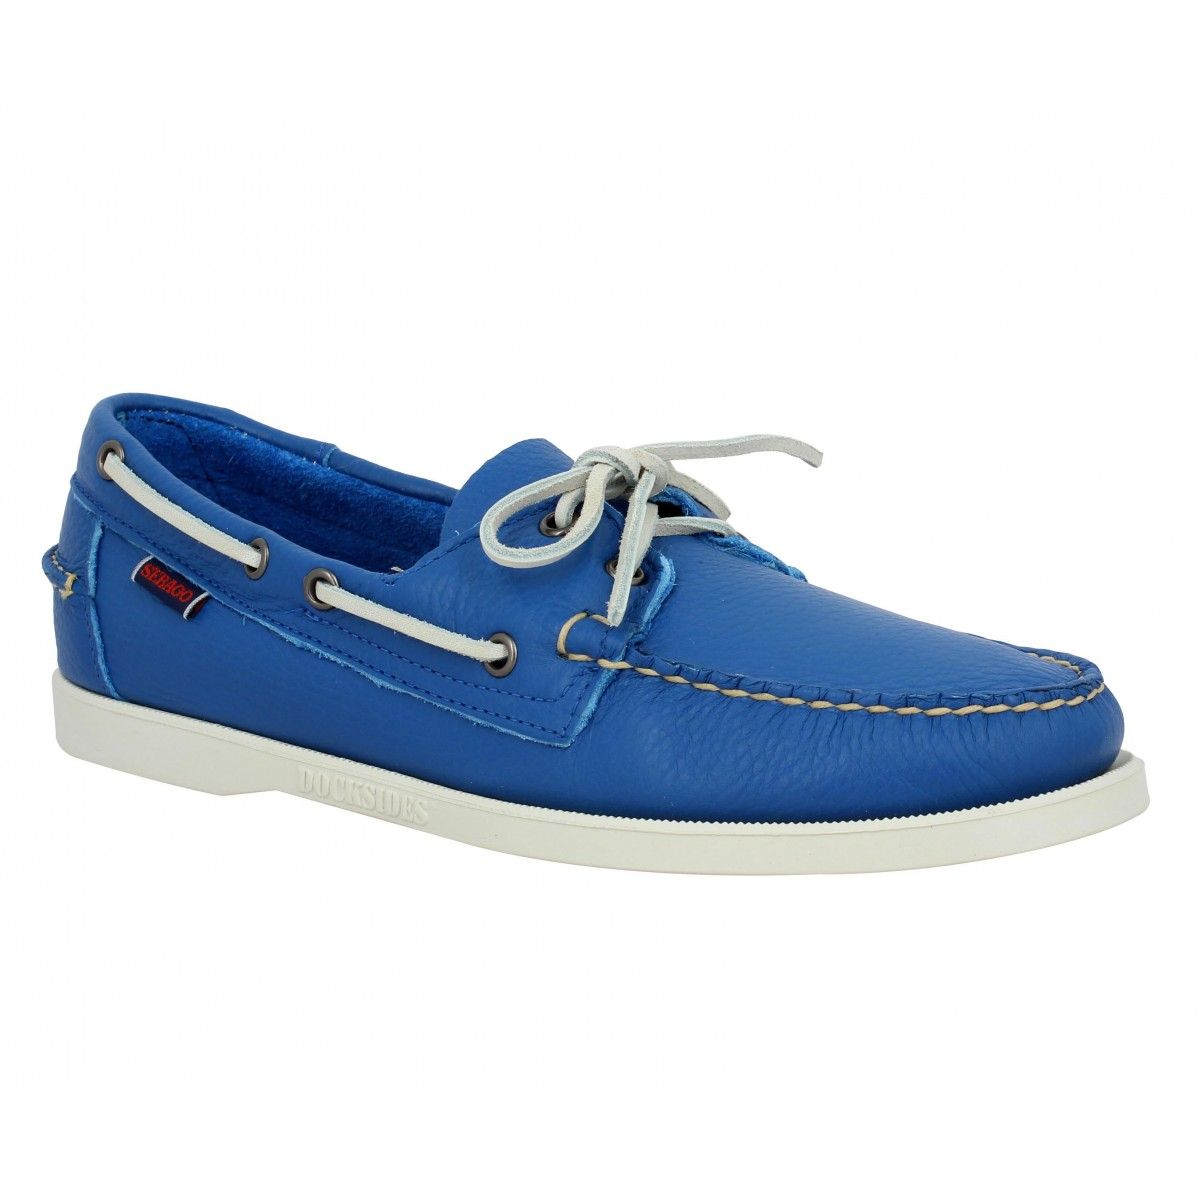 Chaussures bateaux SEBAGO Docksides cuir Homme Bleu Vif